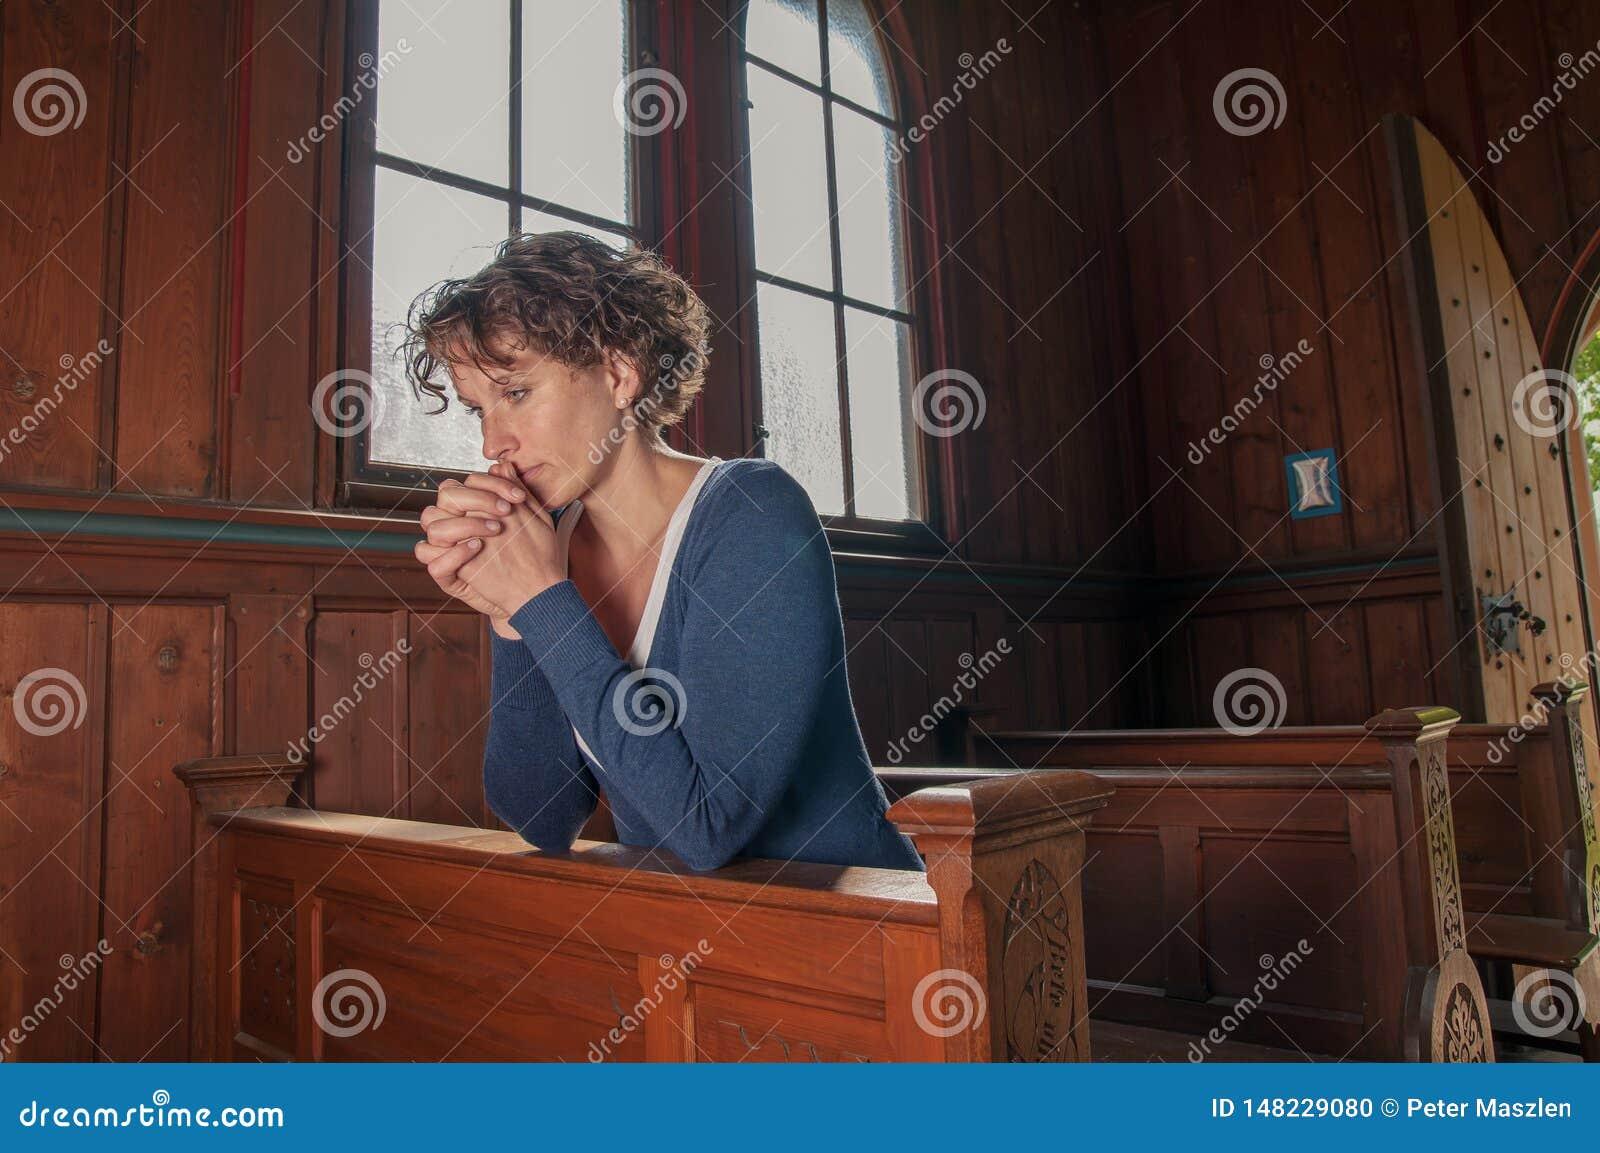 Young woman praying in the church